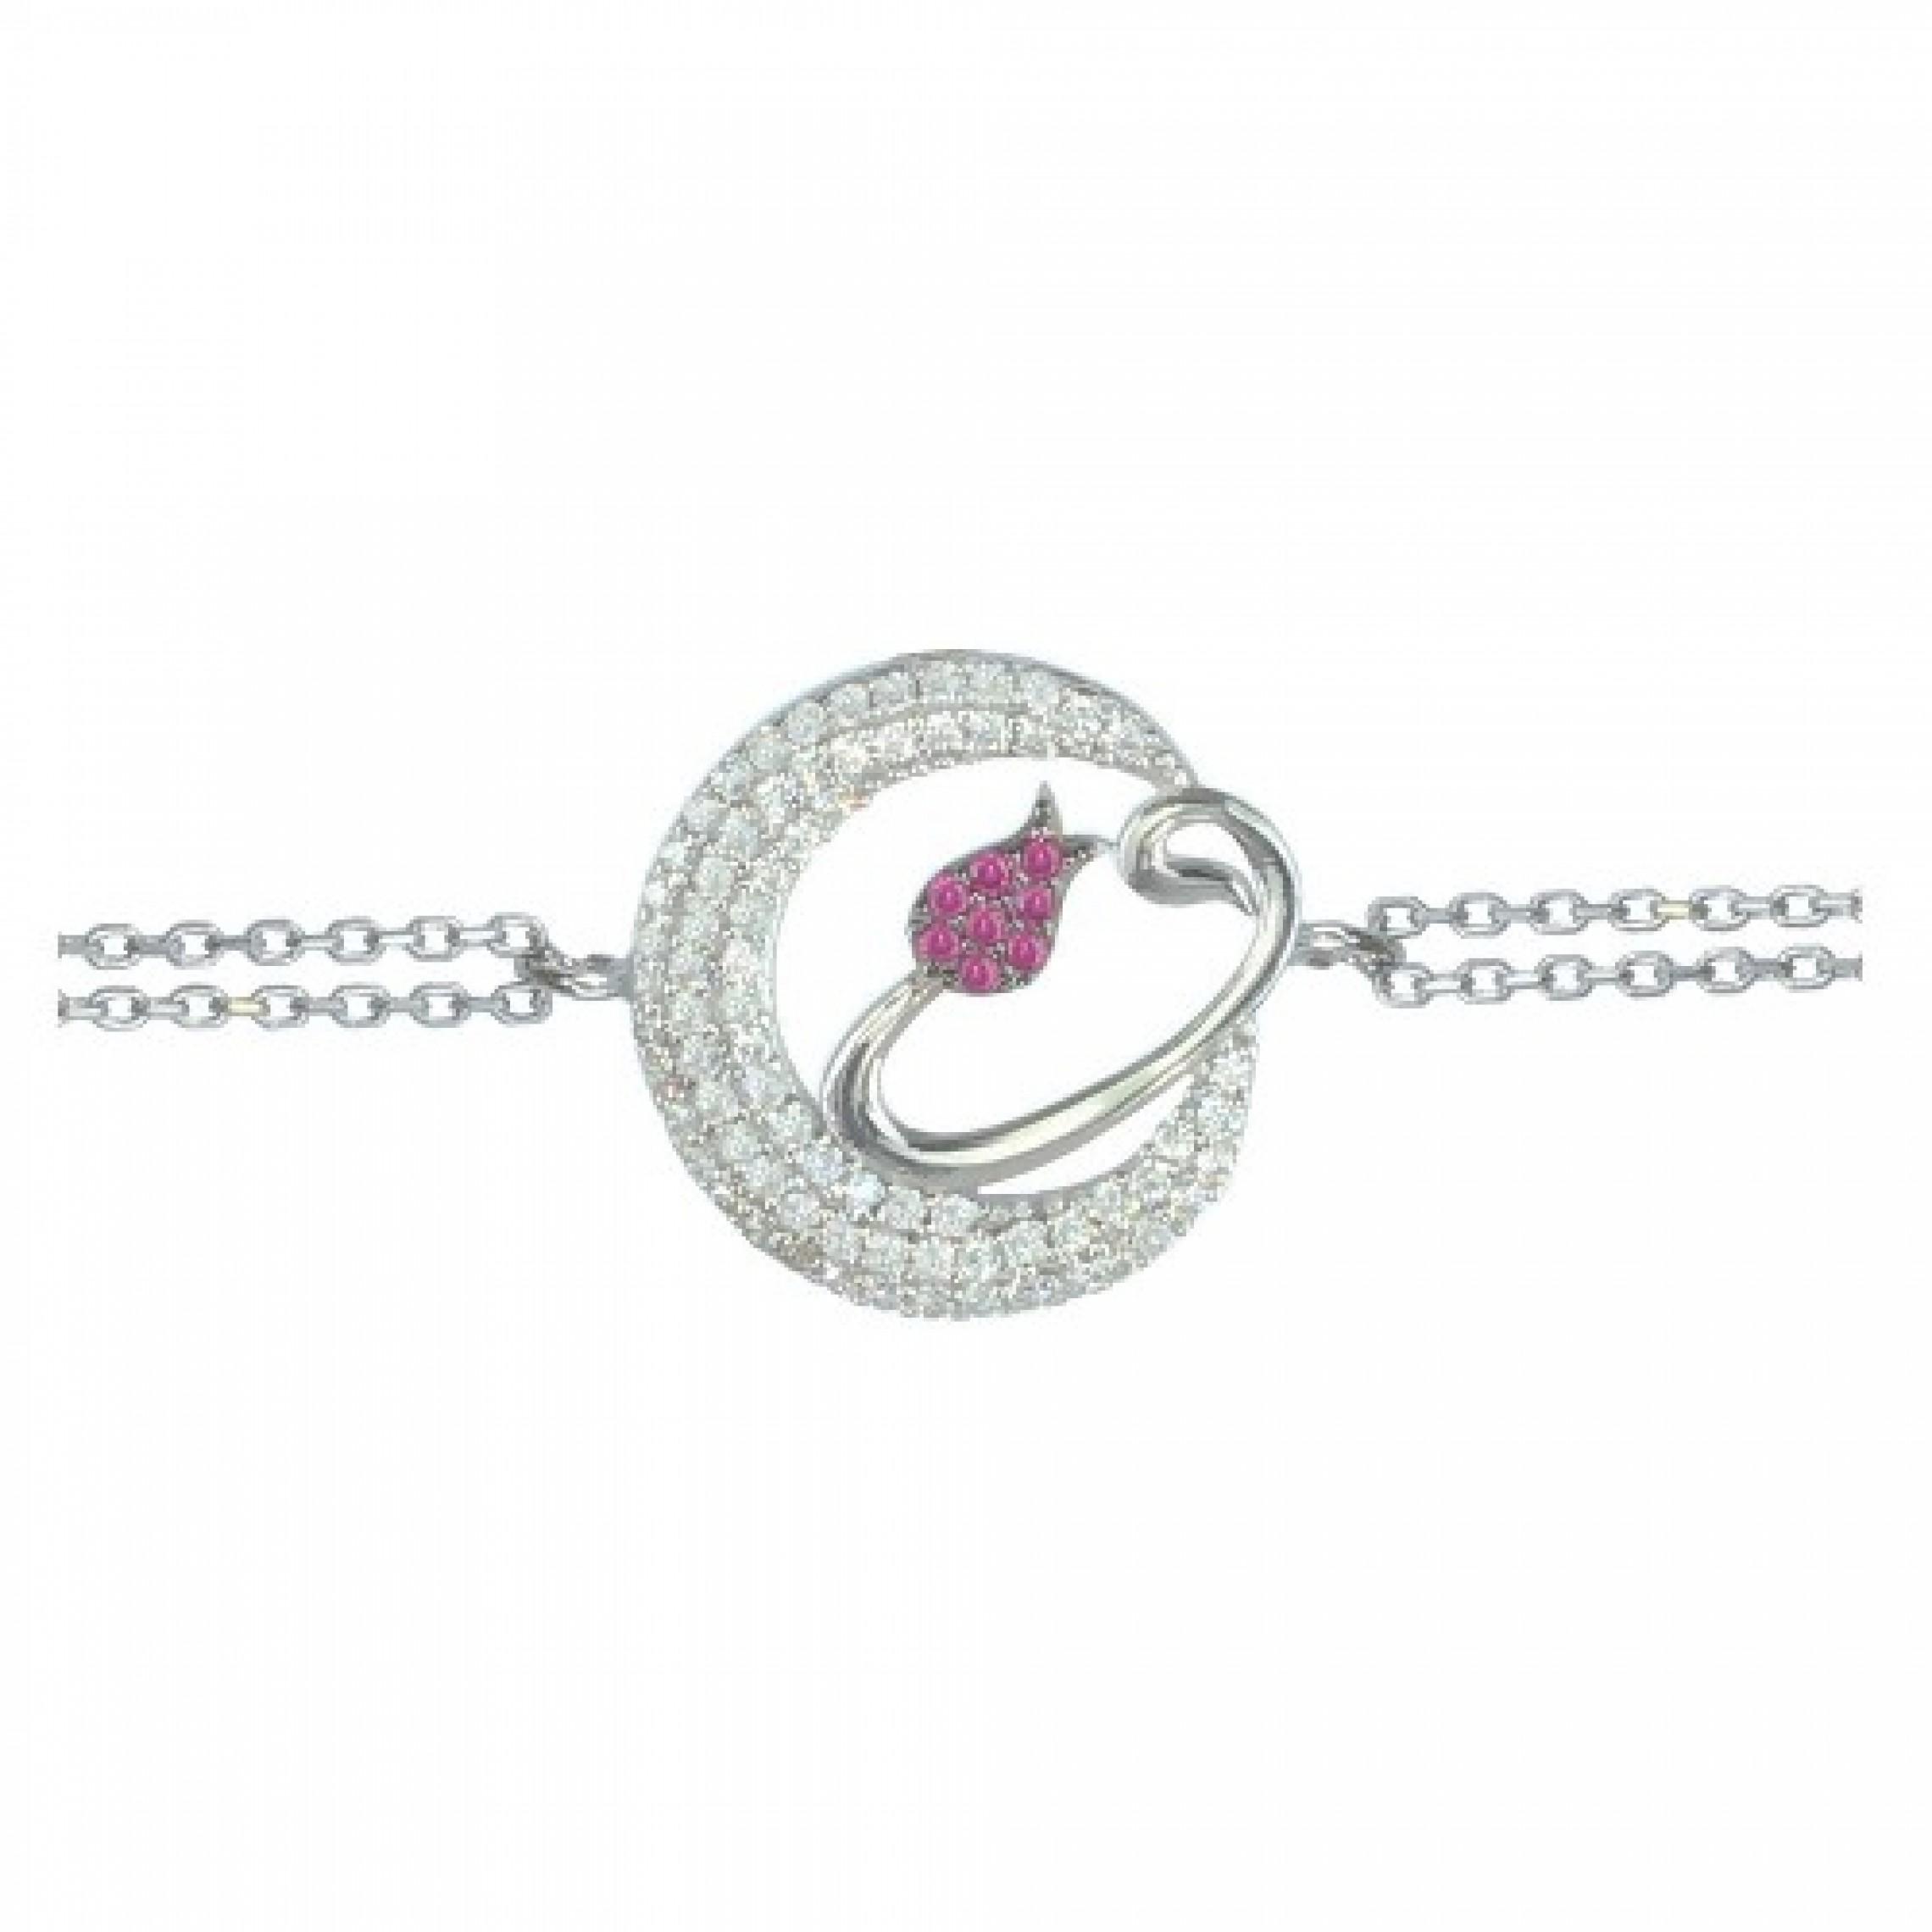 SB-13 Evil Eye 925 Sterling Silver CZ Bracelet